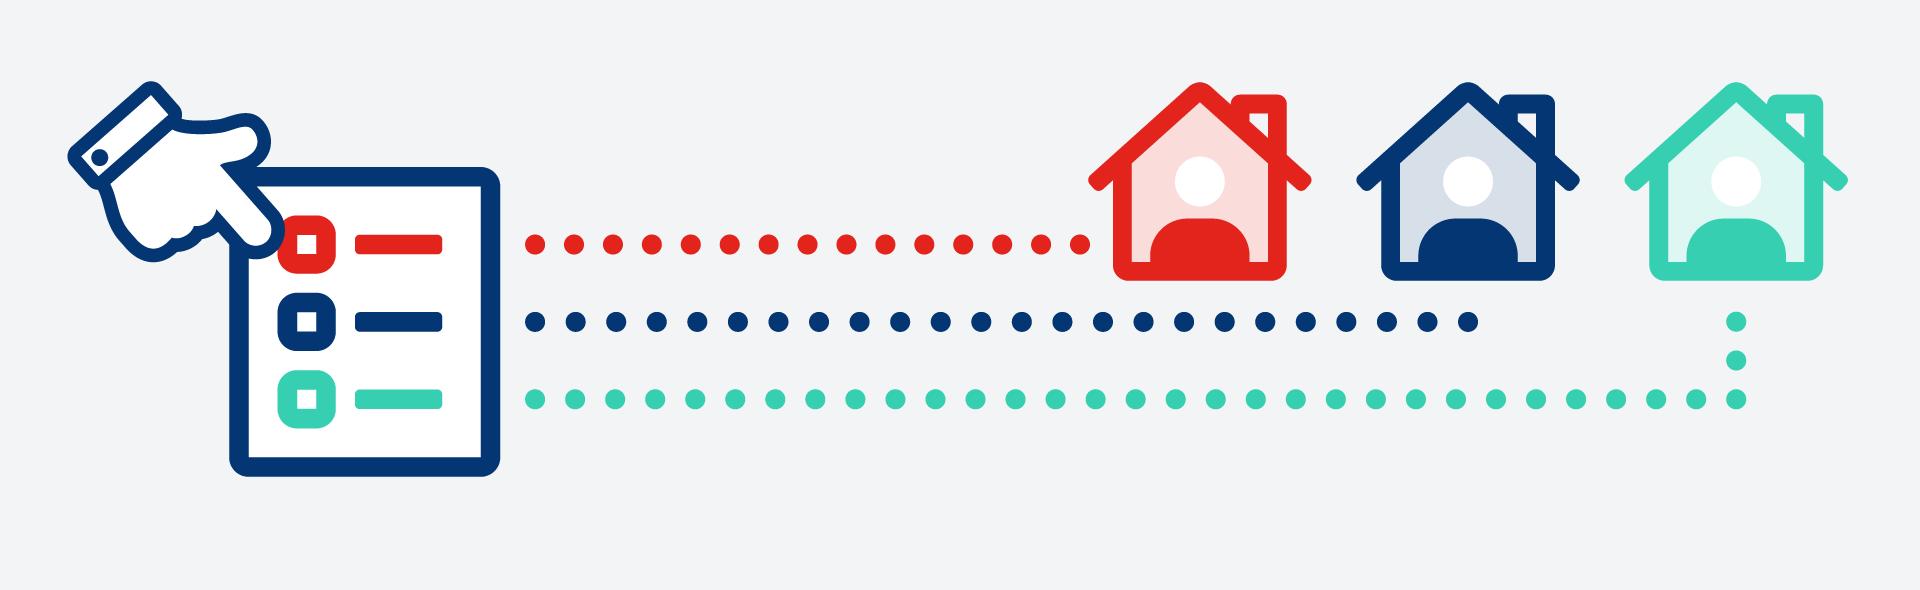 hoe pas je ITIL4 toe op het thuiswerken tips